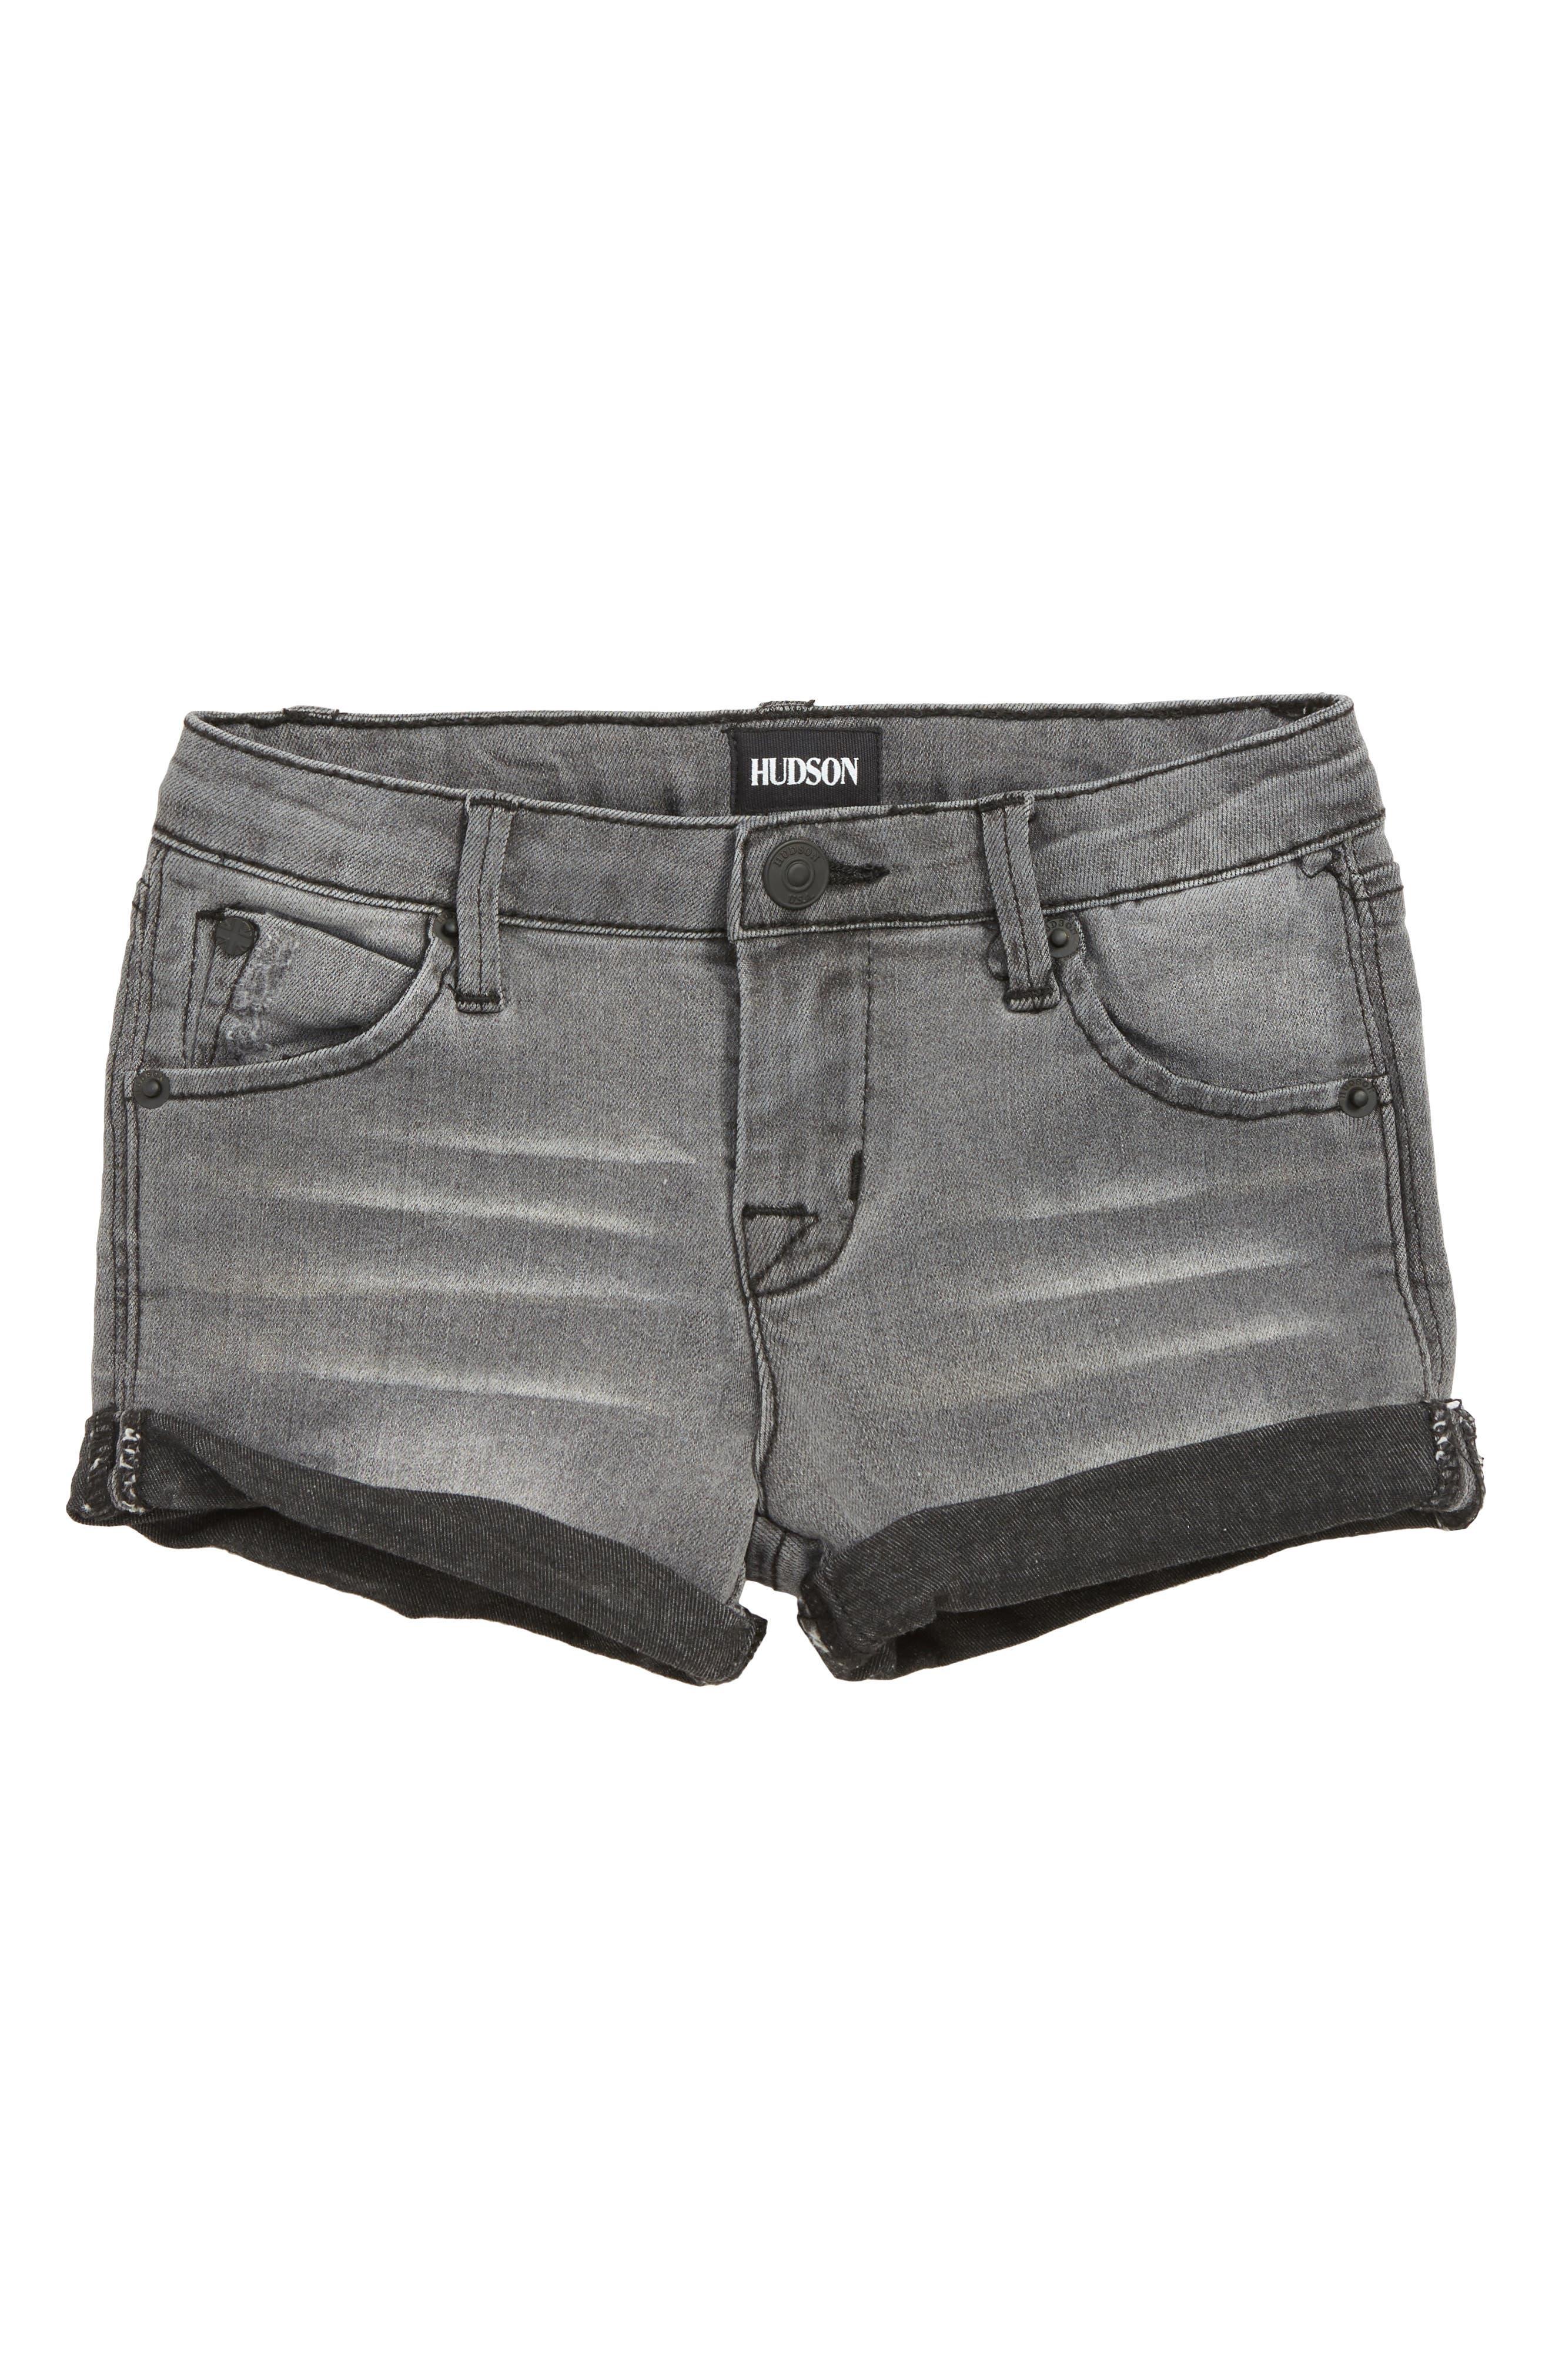 Roll Cuff Denim Shorts,                         Main,                         color, HEATHER GREY